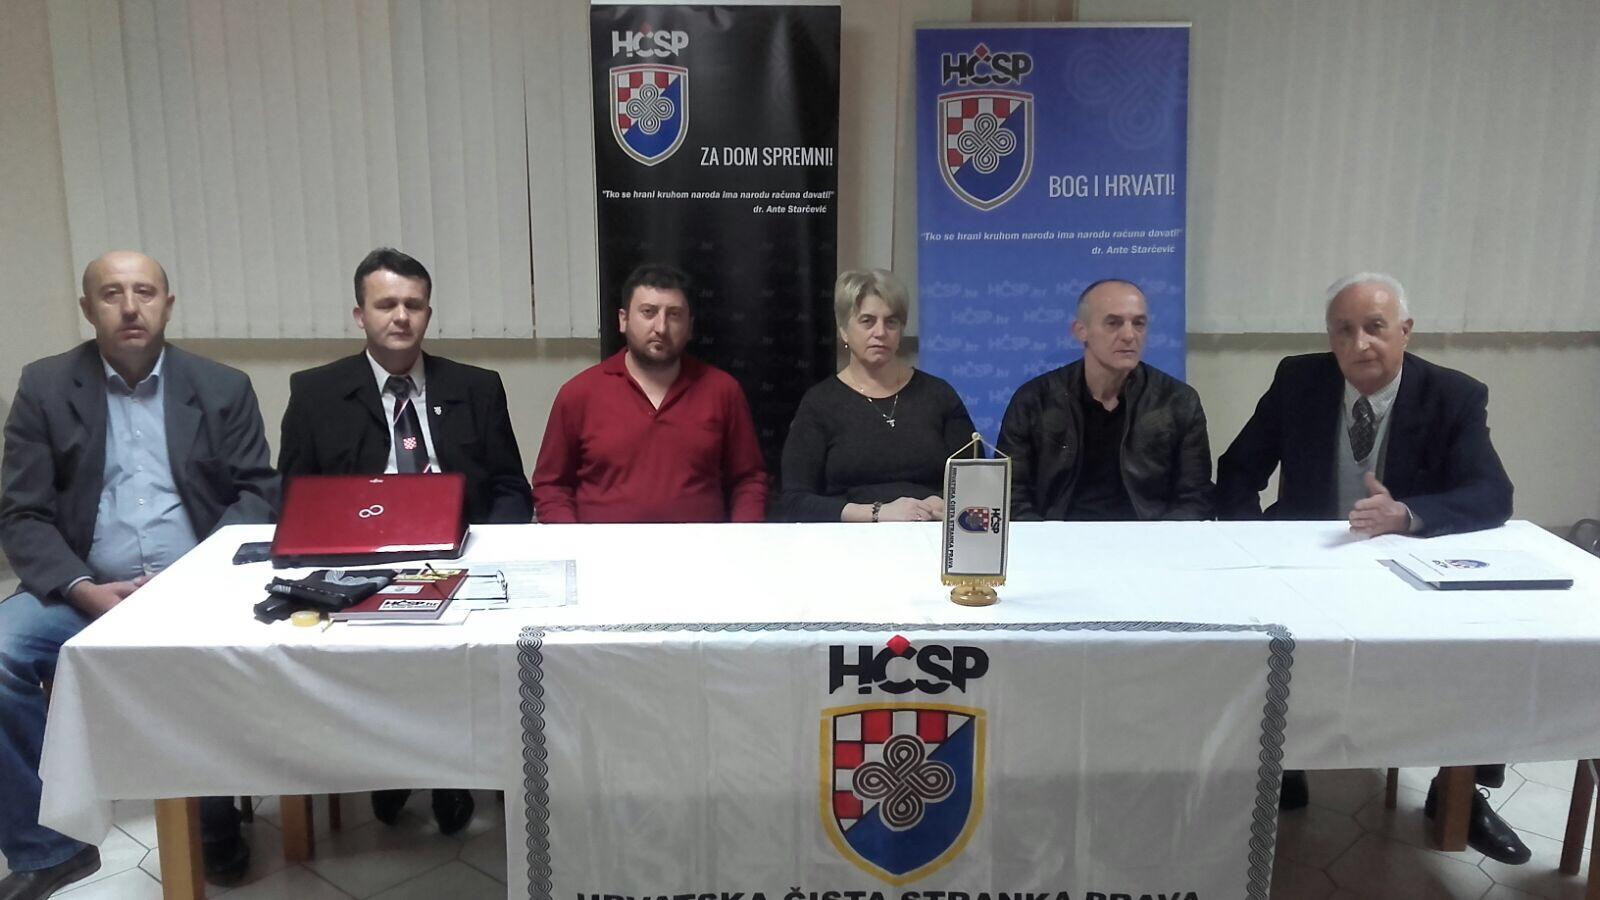 Ivanic_Grad_podruznica_hcsp